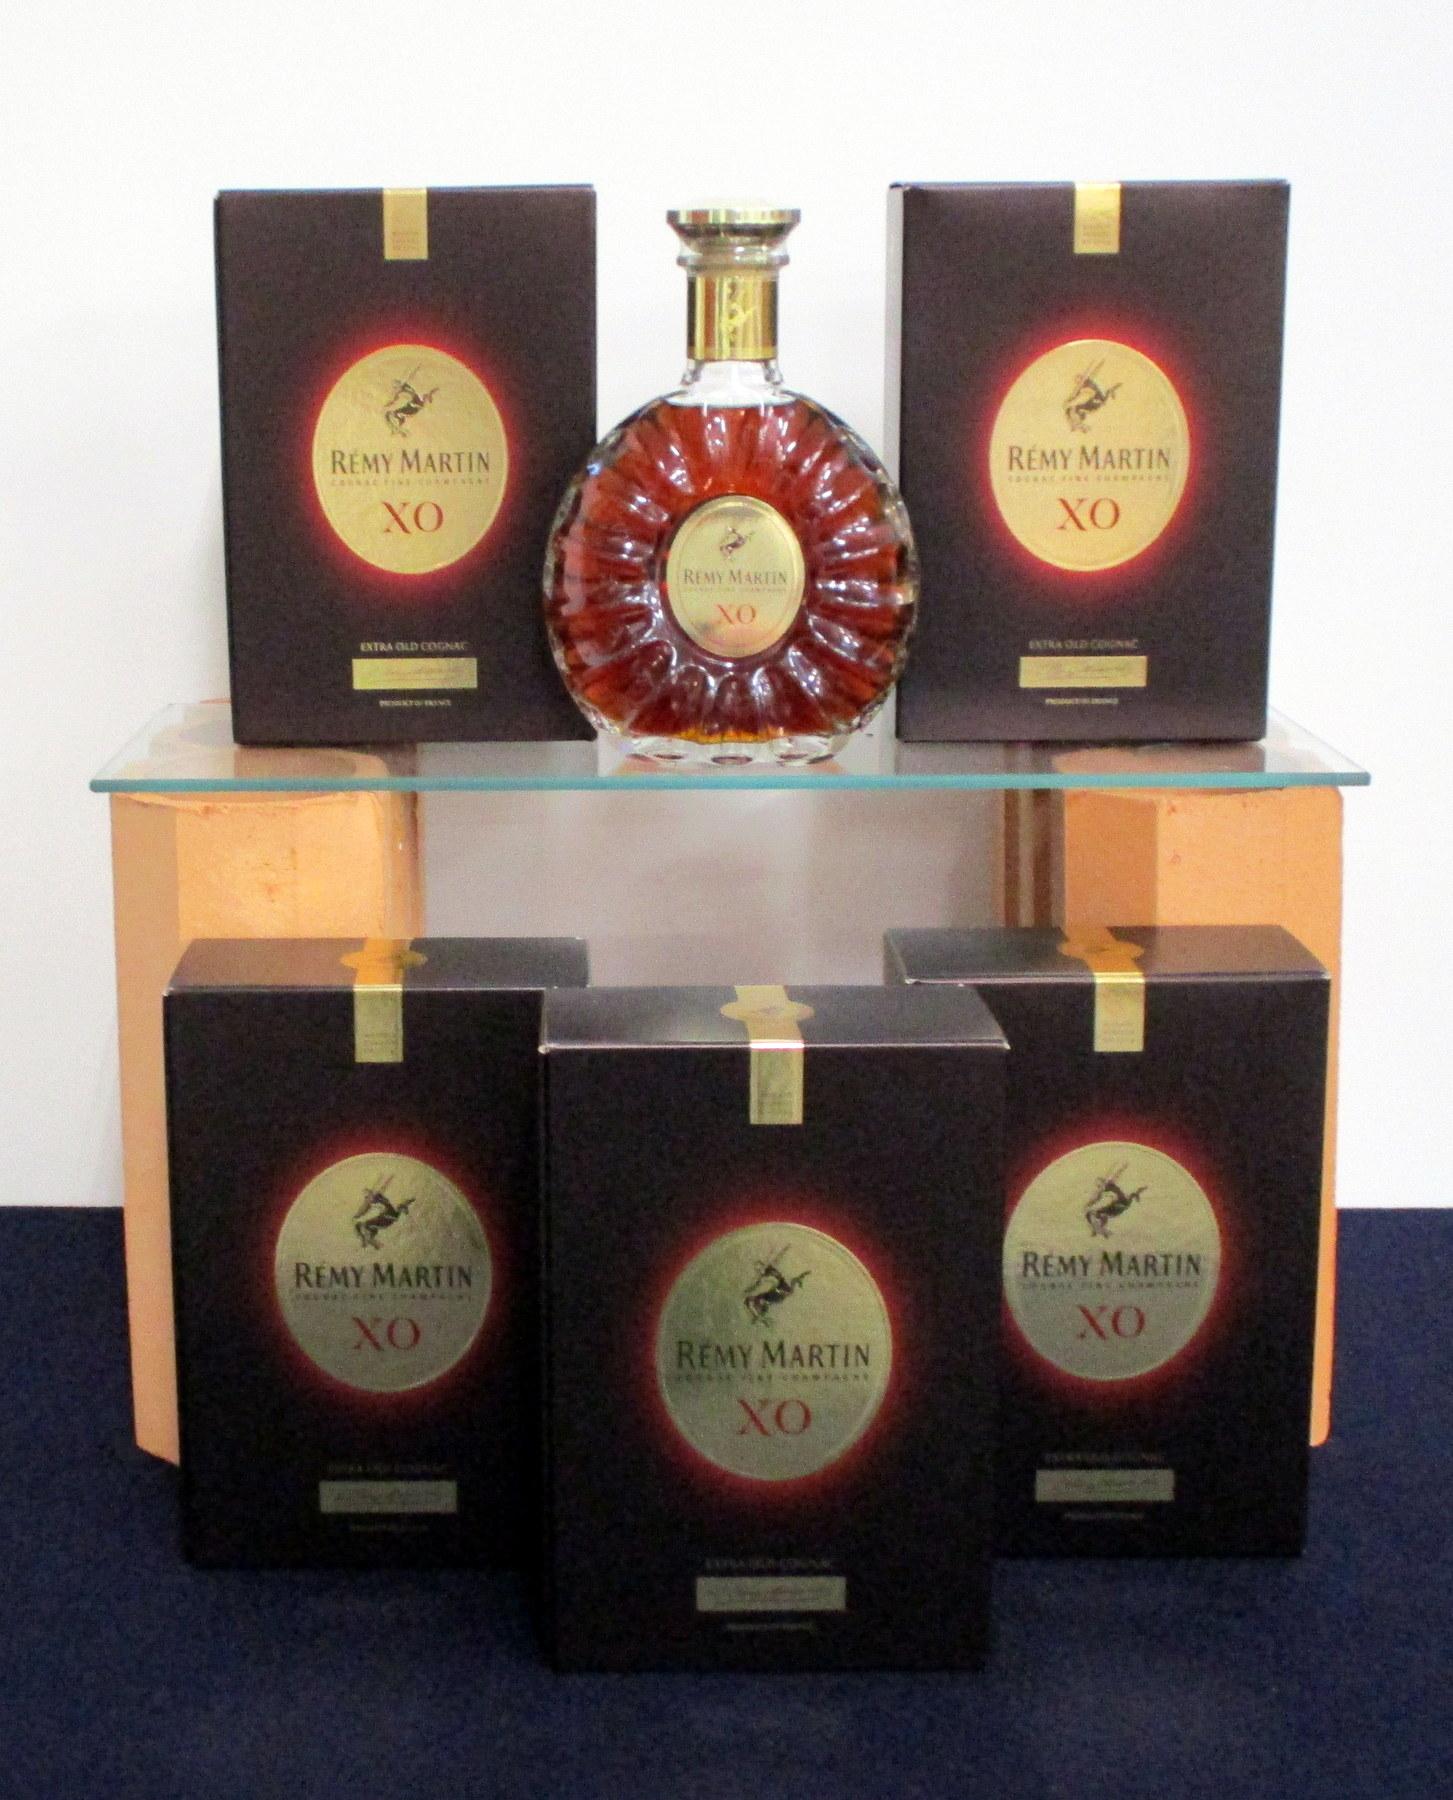 6 70-cl bts Remy Martin XO Fine Champagne Cognac ind oc